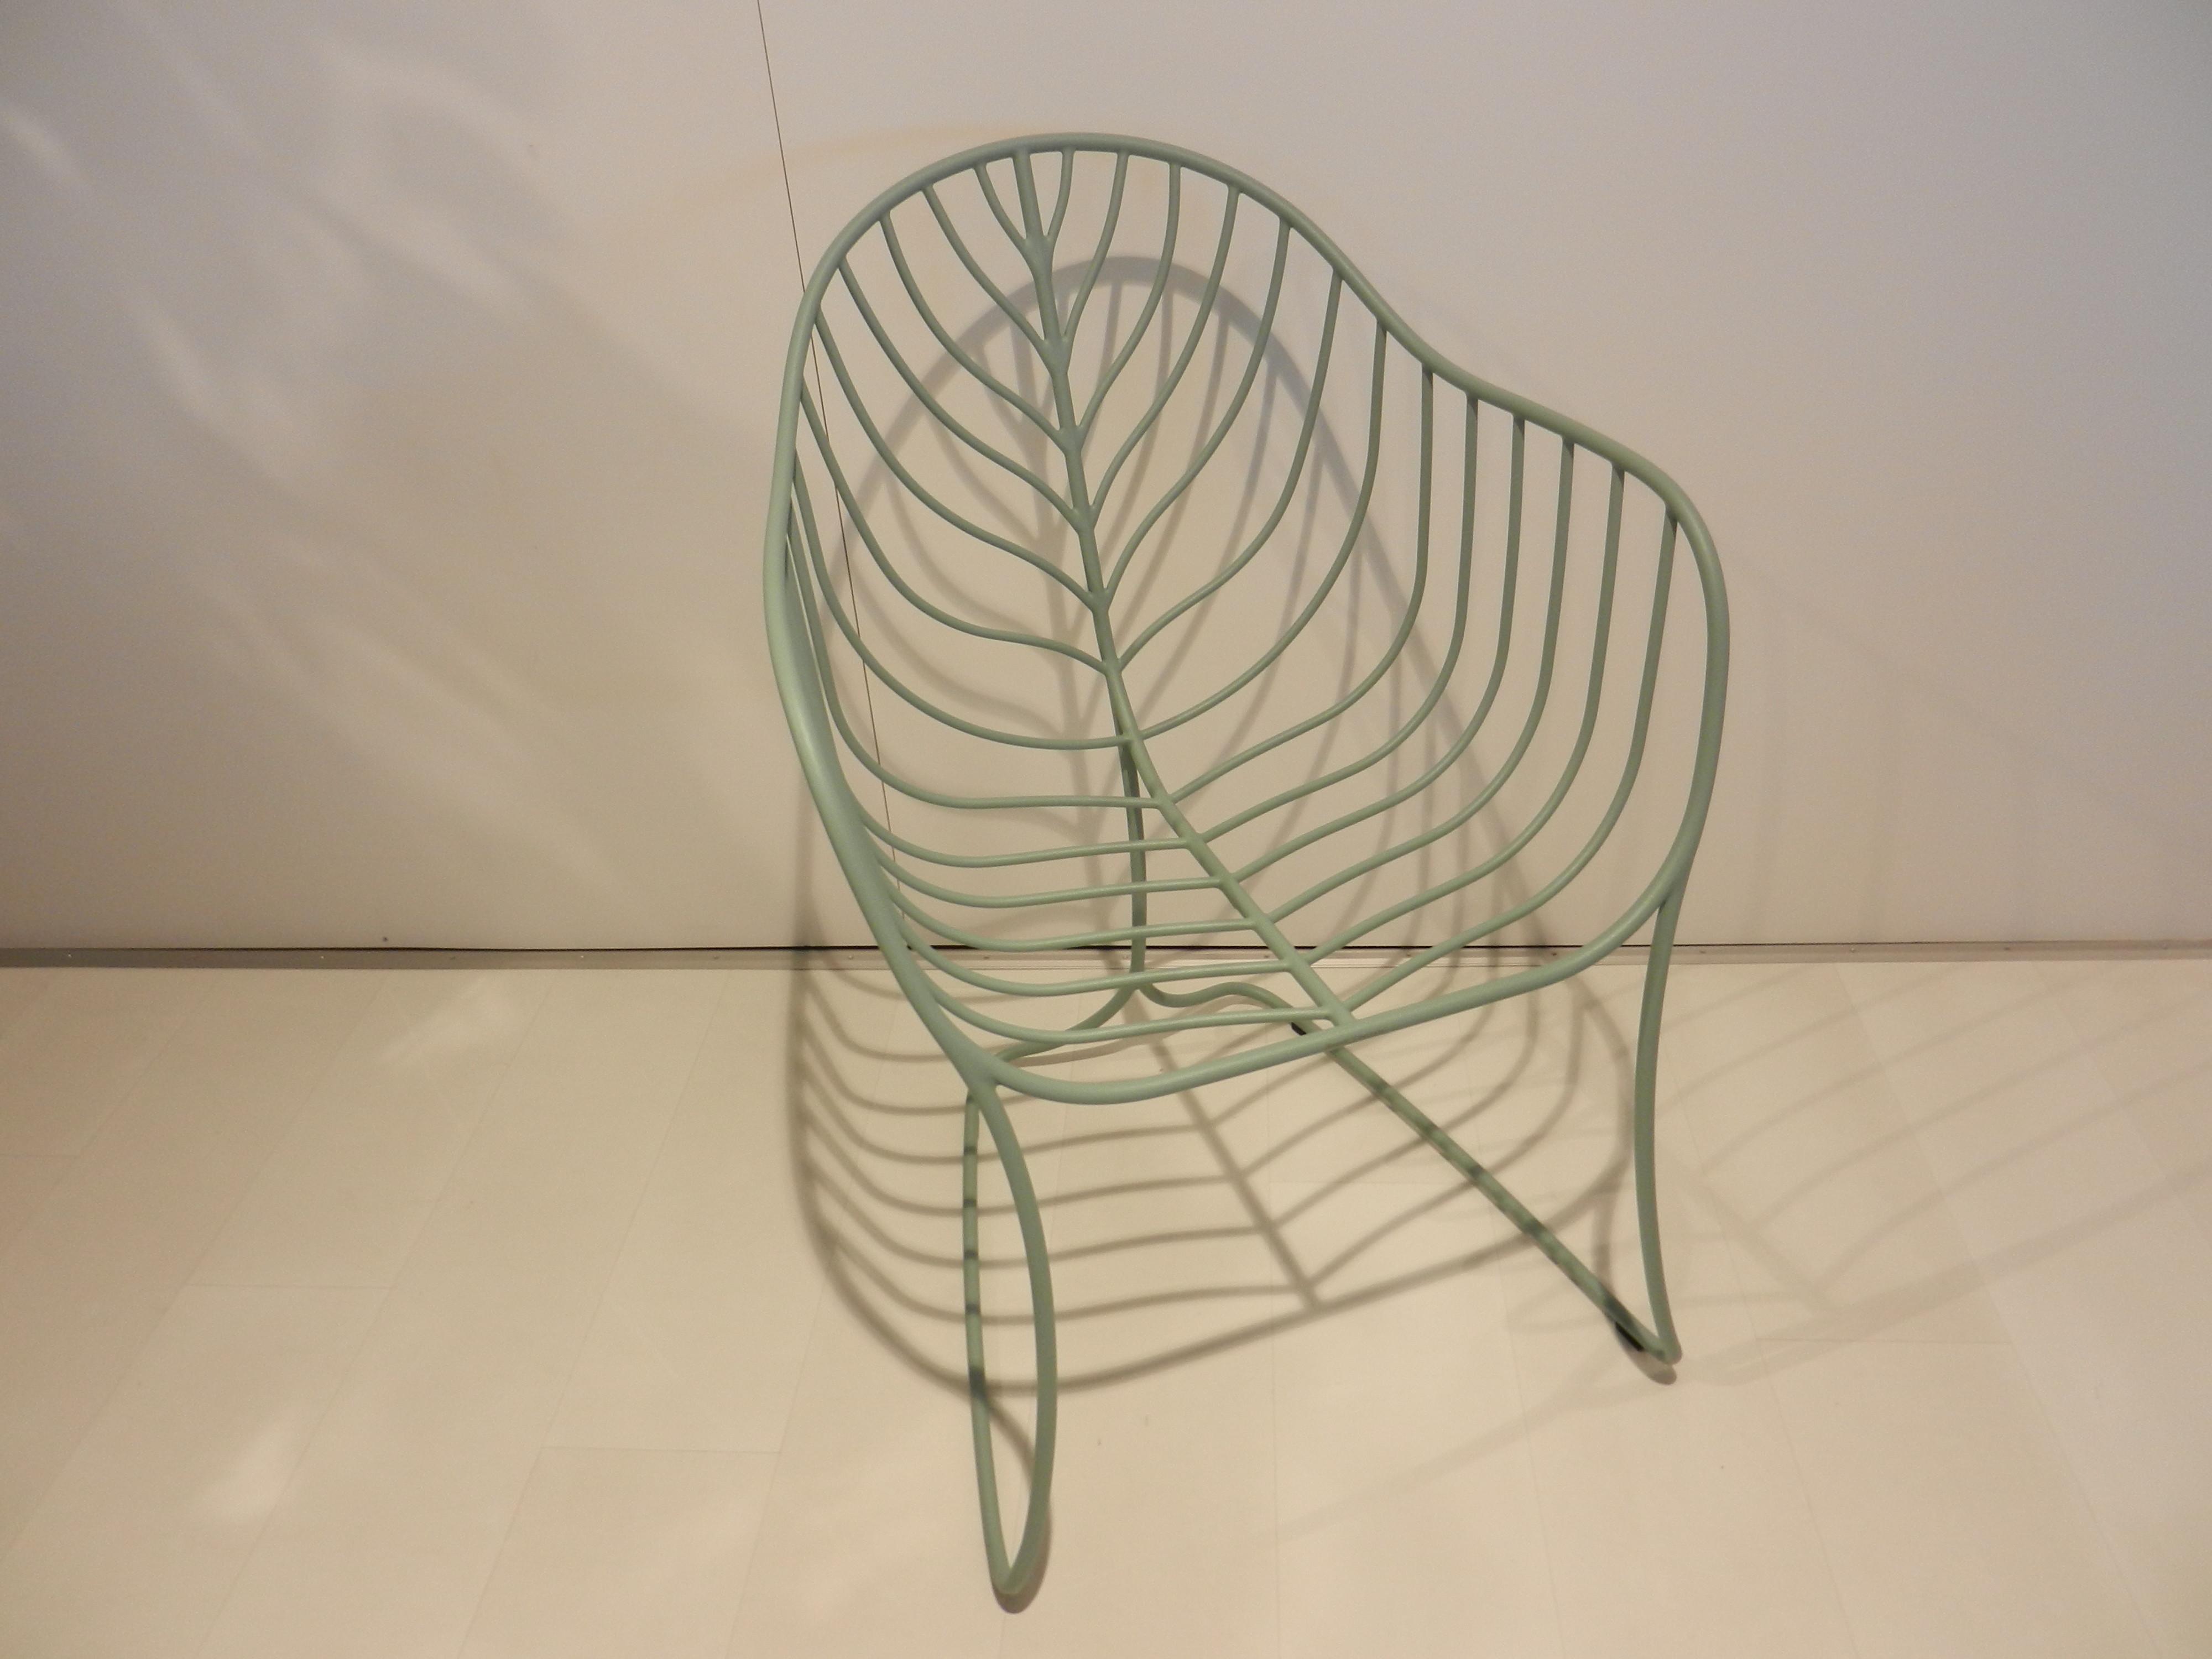 4 Stühle Folia von Royal Botania 01